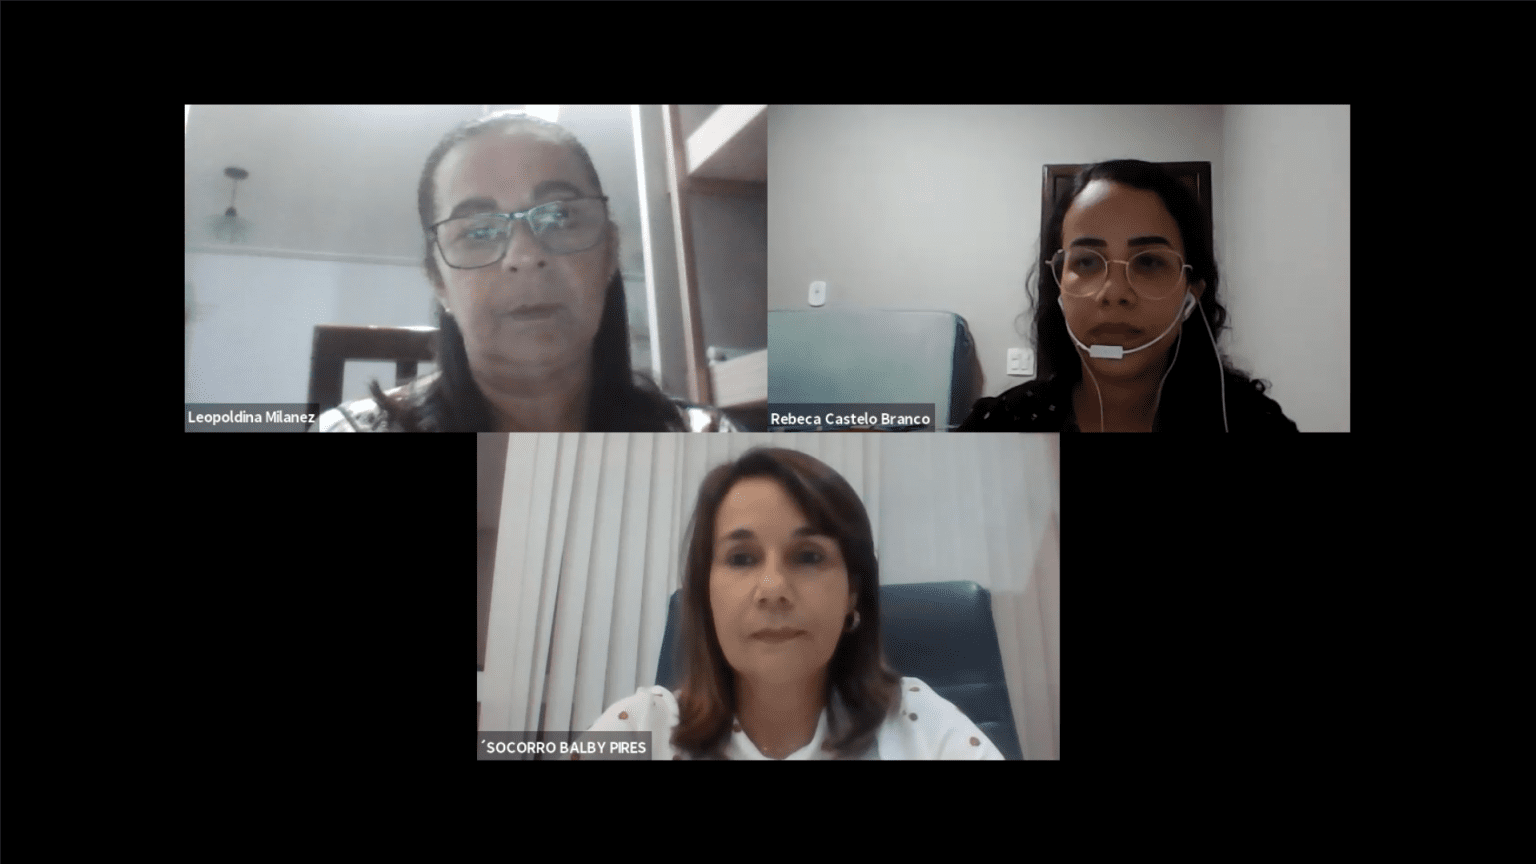 Pé Torto Congênito: A Importância Do Diagnóstico E Tratamento Precoces